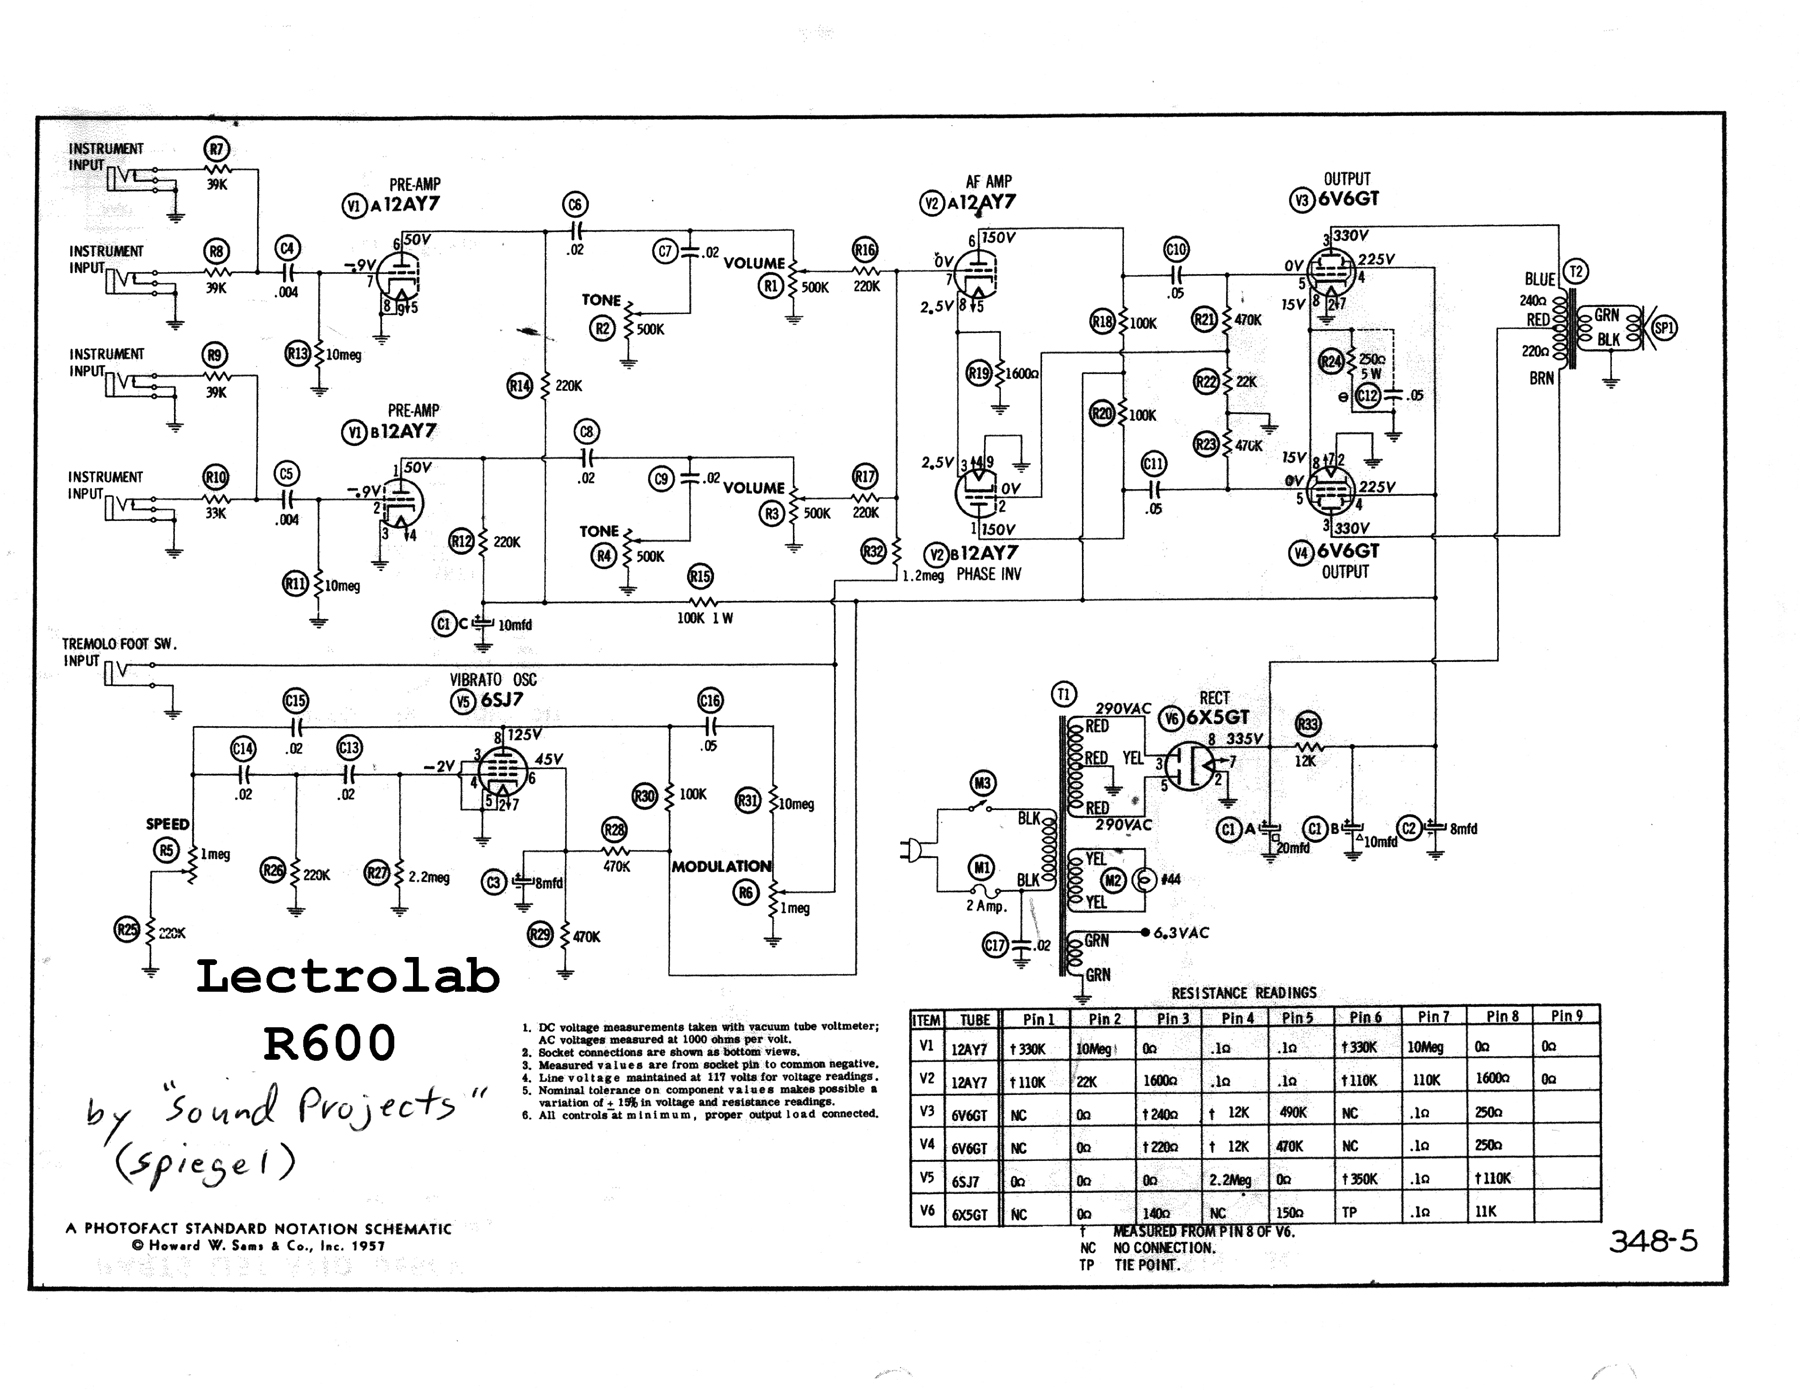 Lectrolab R600 Schematic